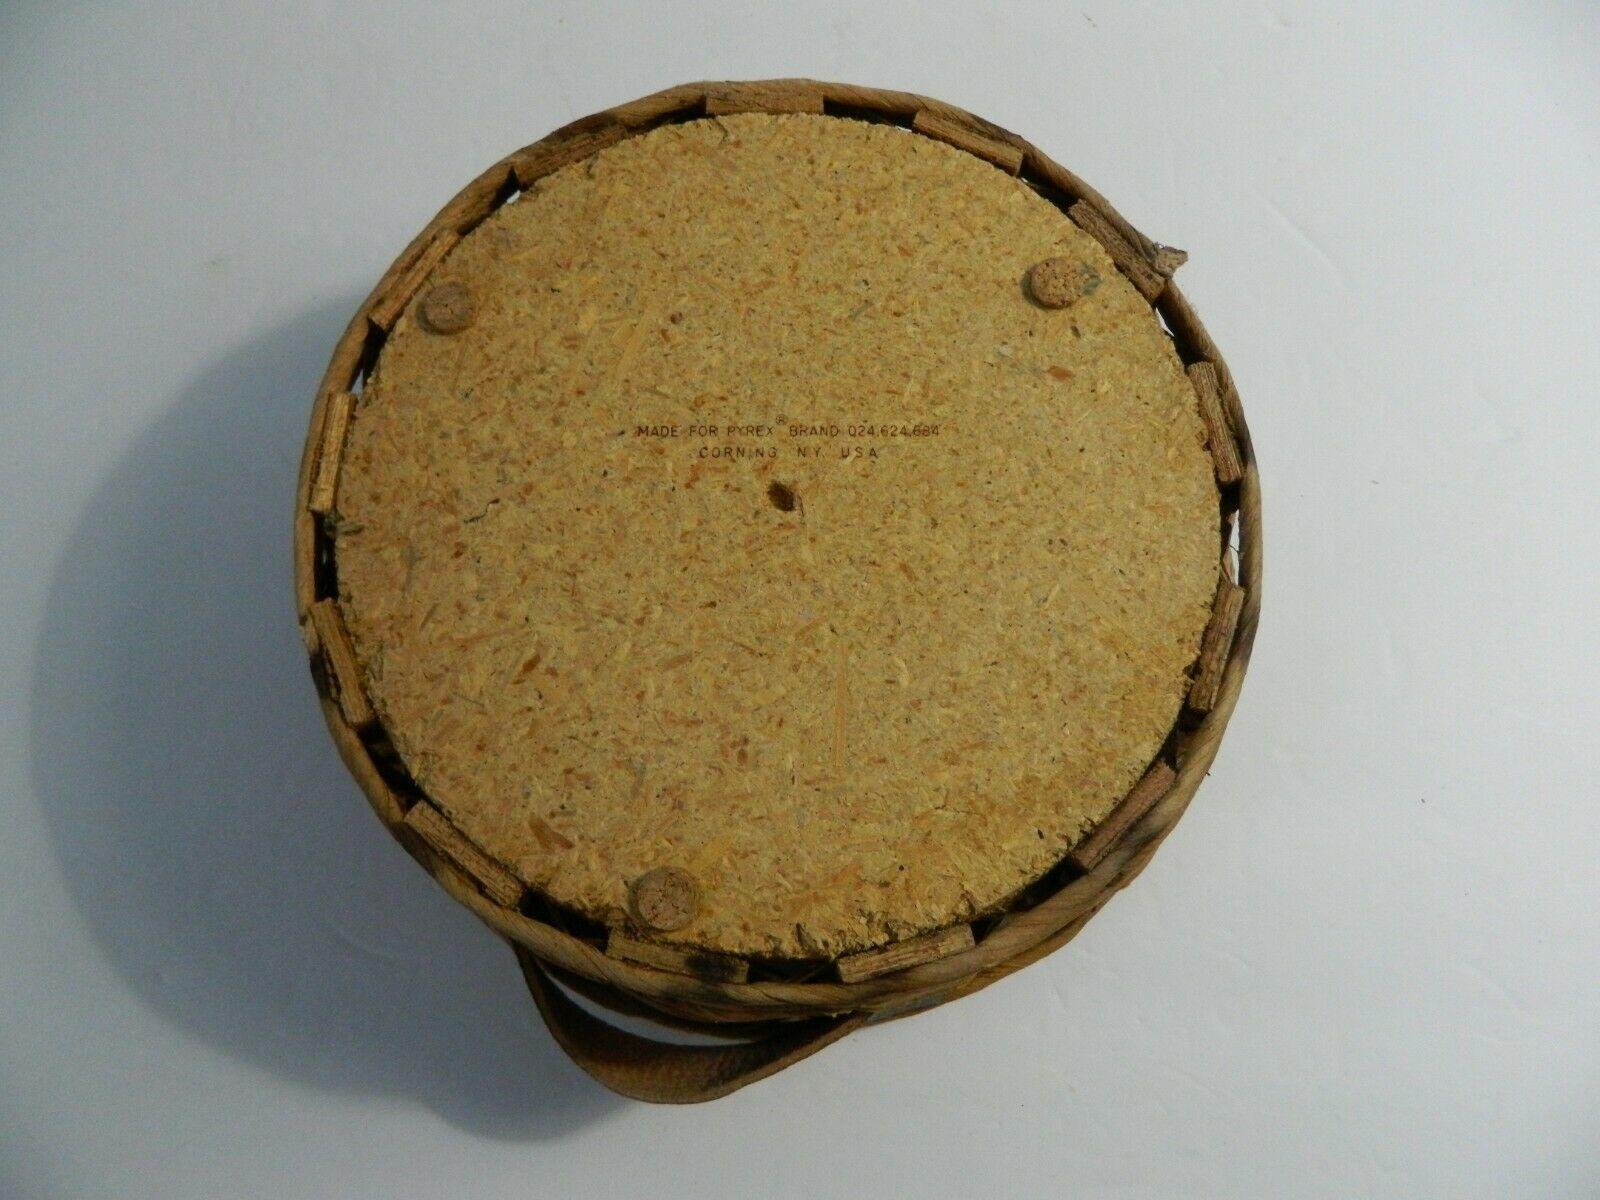 Vintage Pyrex Wicker Wood 2 Qt Casserole Dish Holder Cradle Fits 024 624 684 image 7